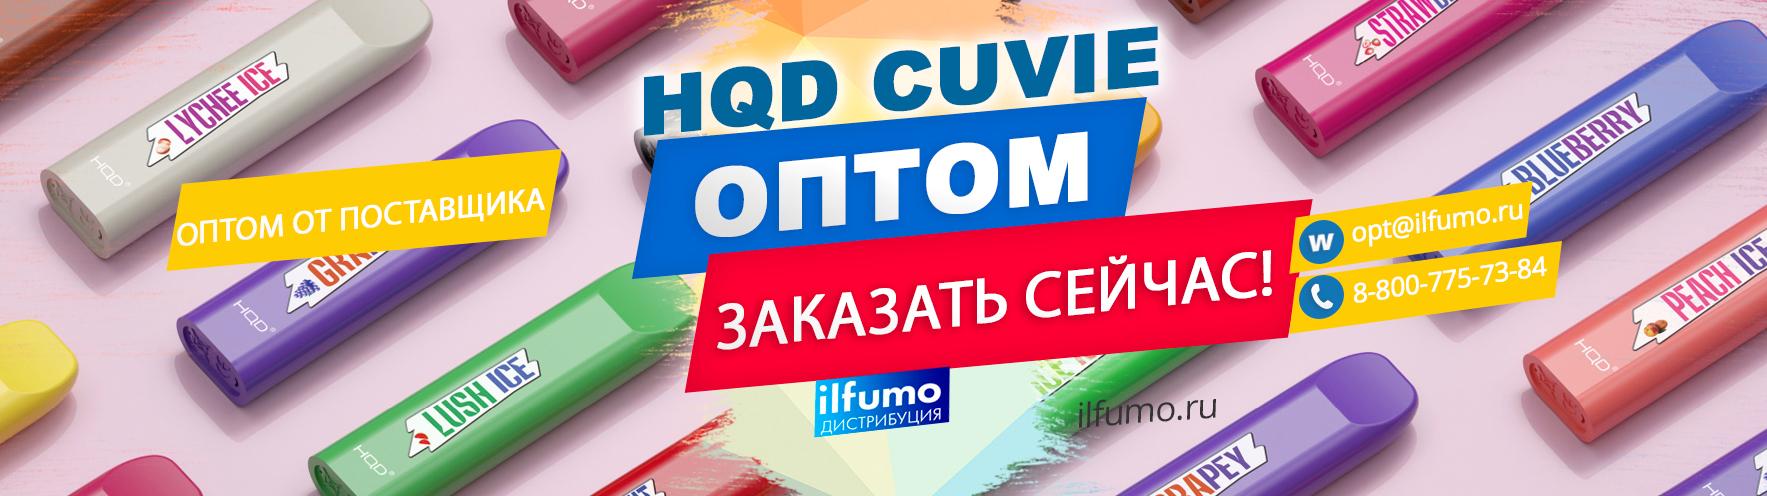 hqd cuvie - Купить оптом одноразовые электронные сигареты HQD